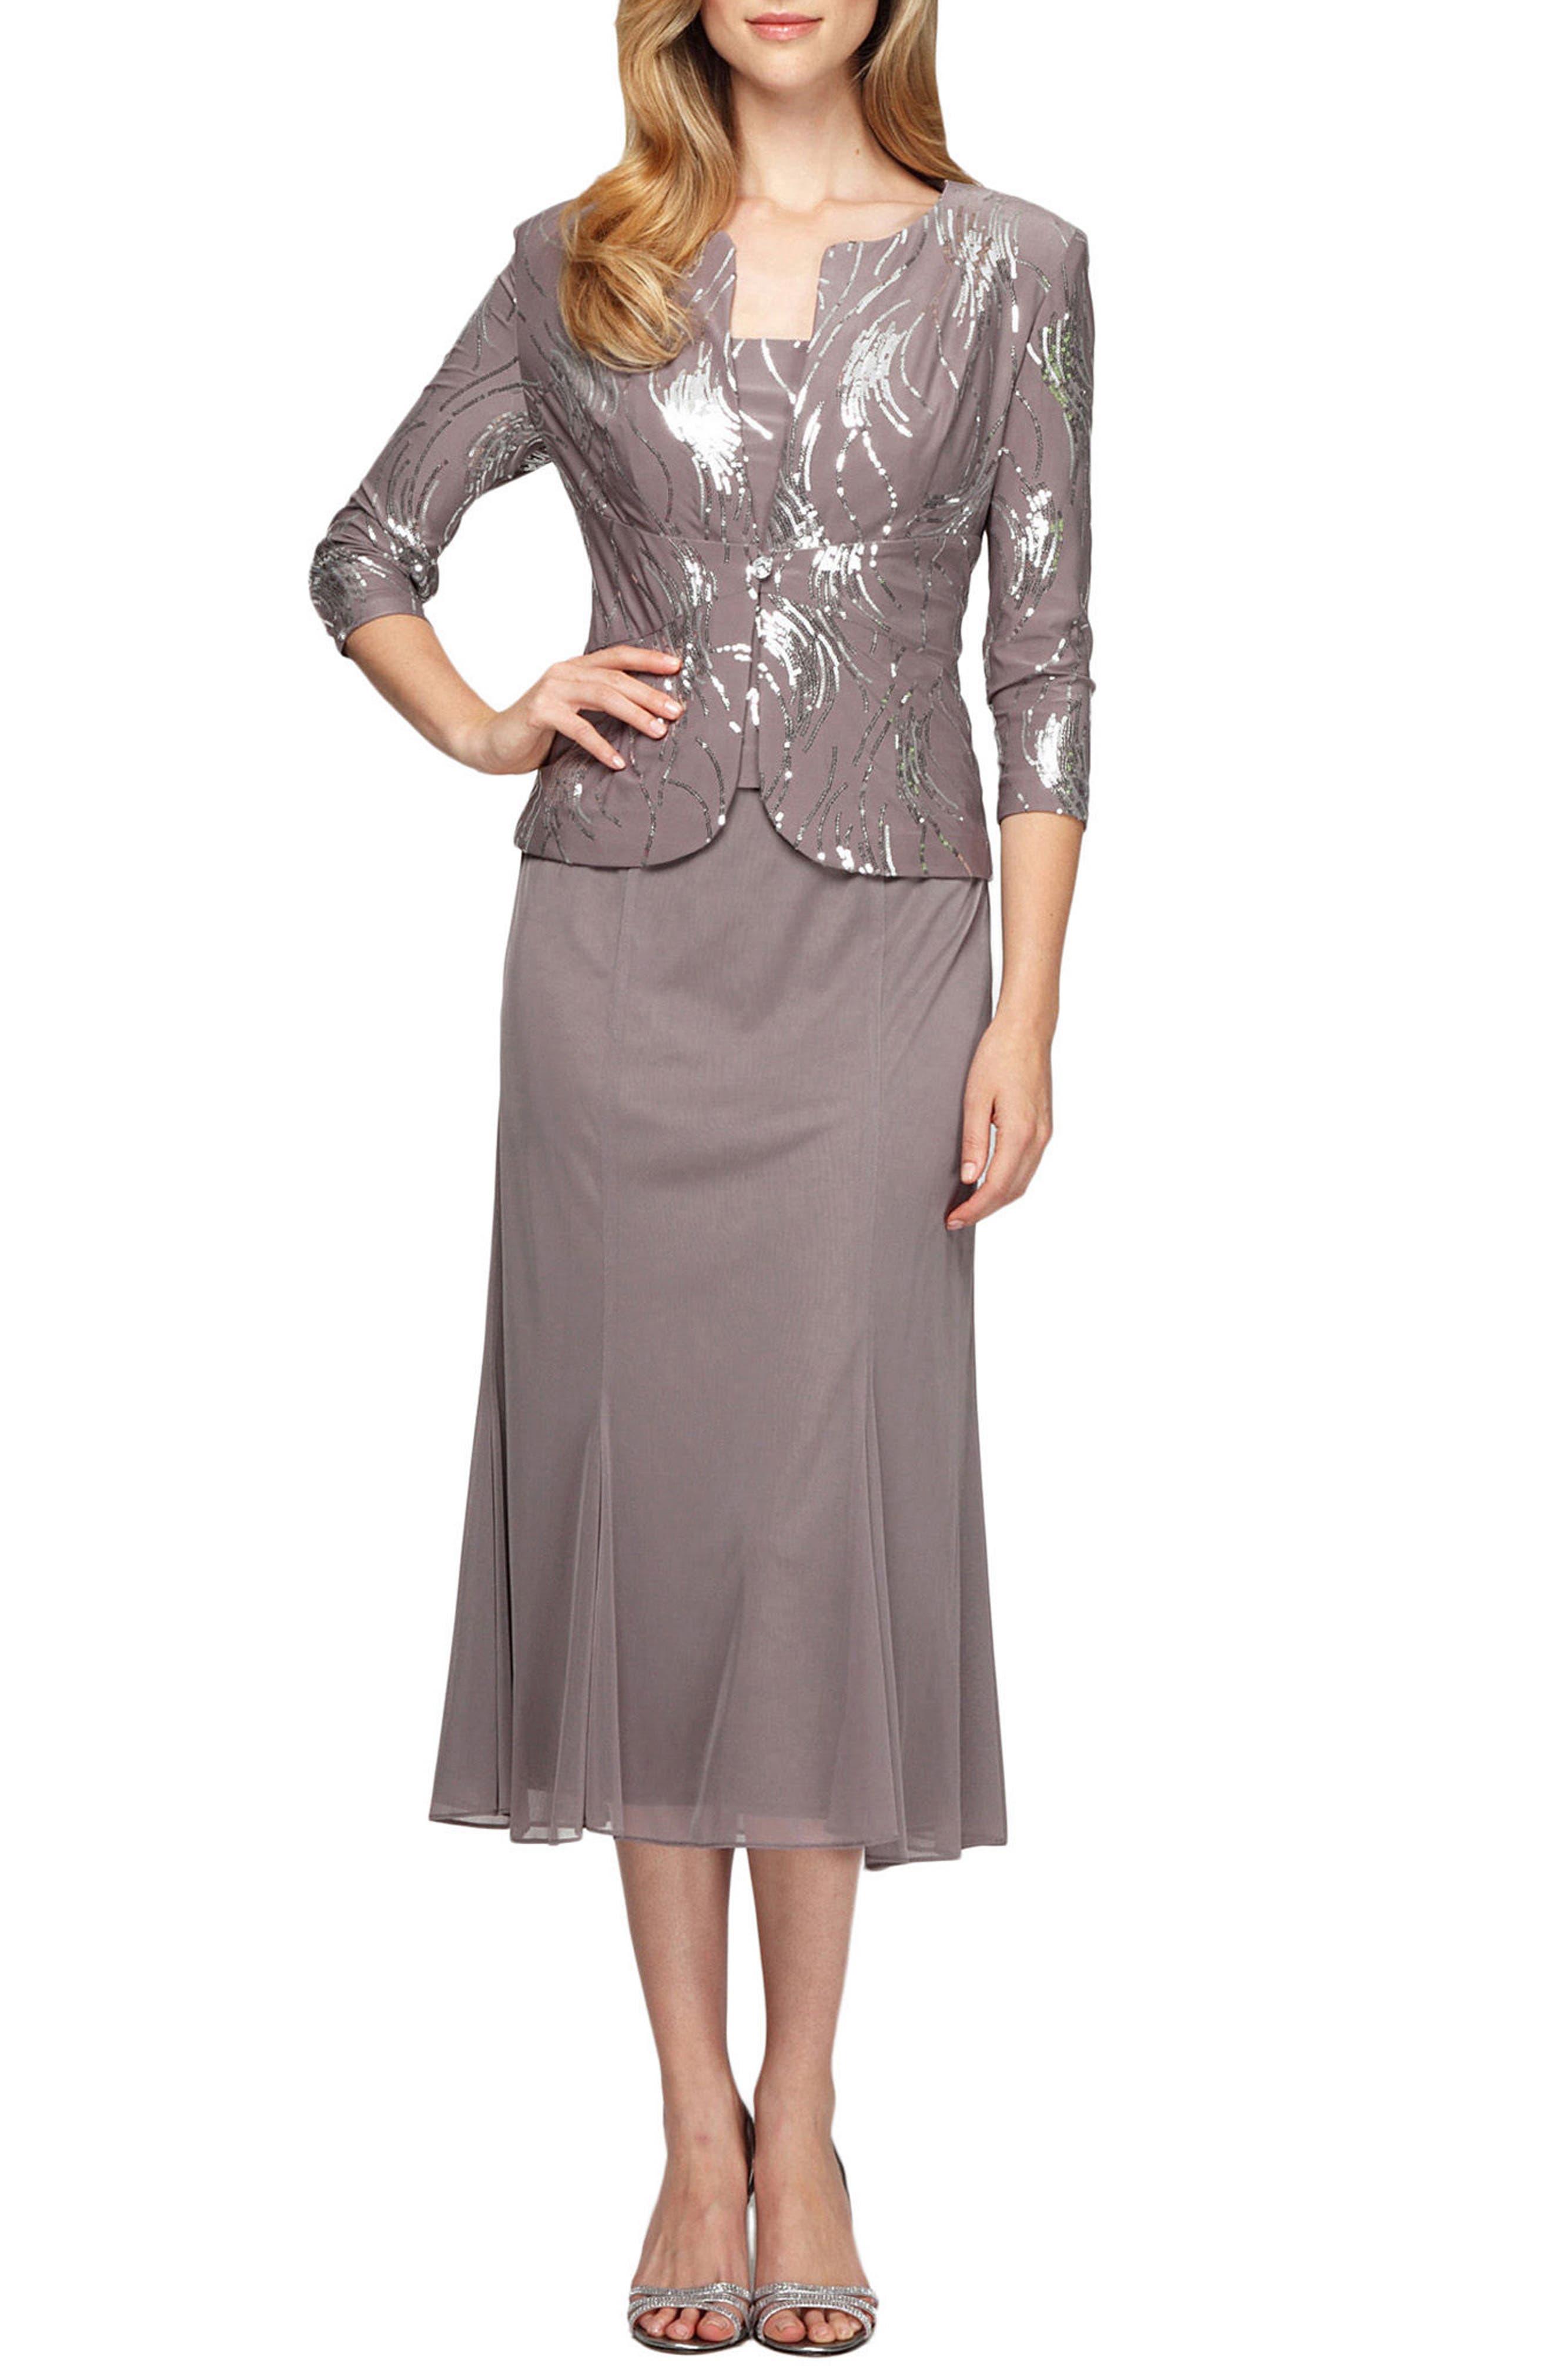 ALEX EVENINGS, Midi Dress & Jacket, Main thumbnail 1, color, PEWTER FROST